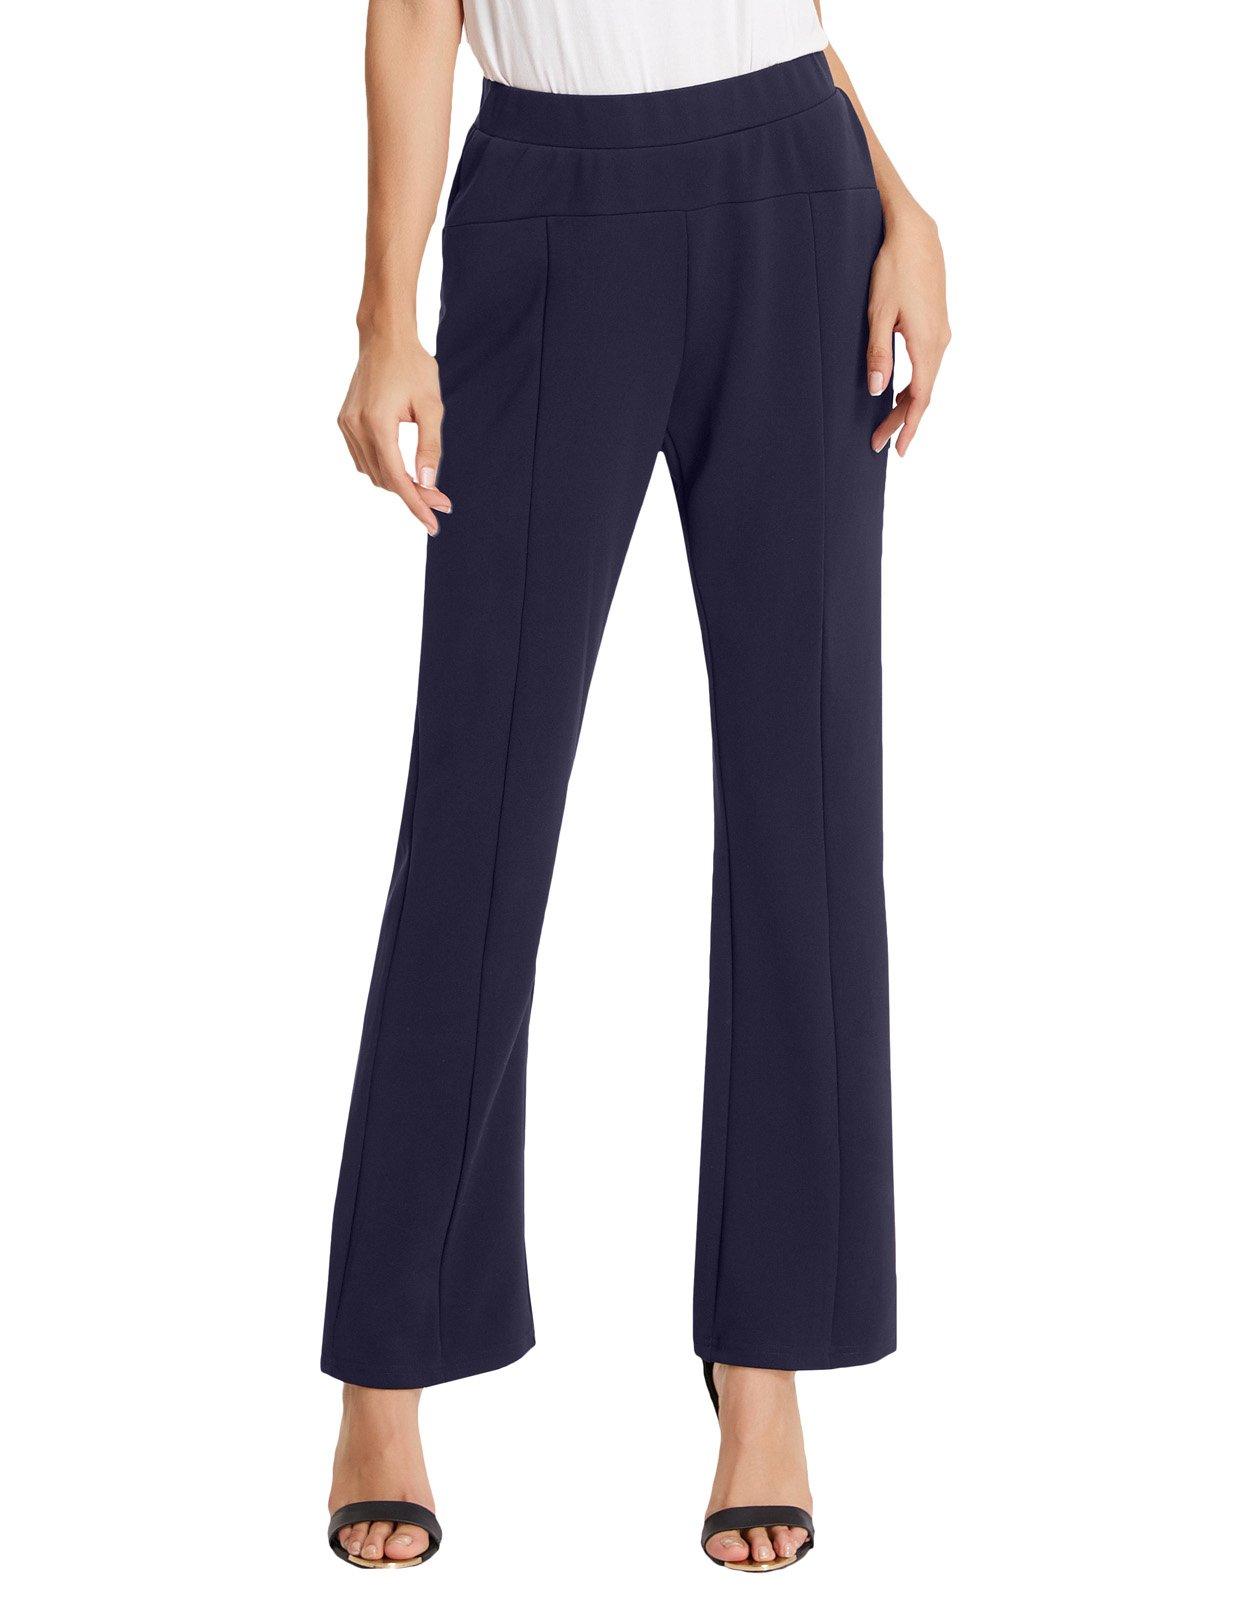 Kate Kasin Womens Elastic Straight Leg Bootcut Trousers Pants L KKAF1018-2 by Kate Kasin (Image #1)